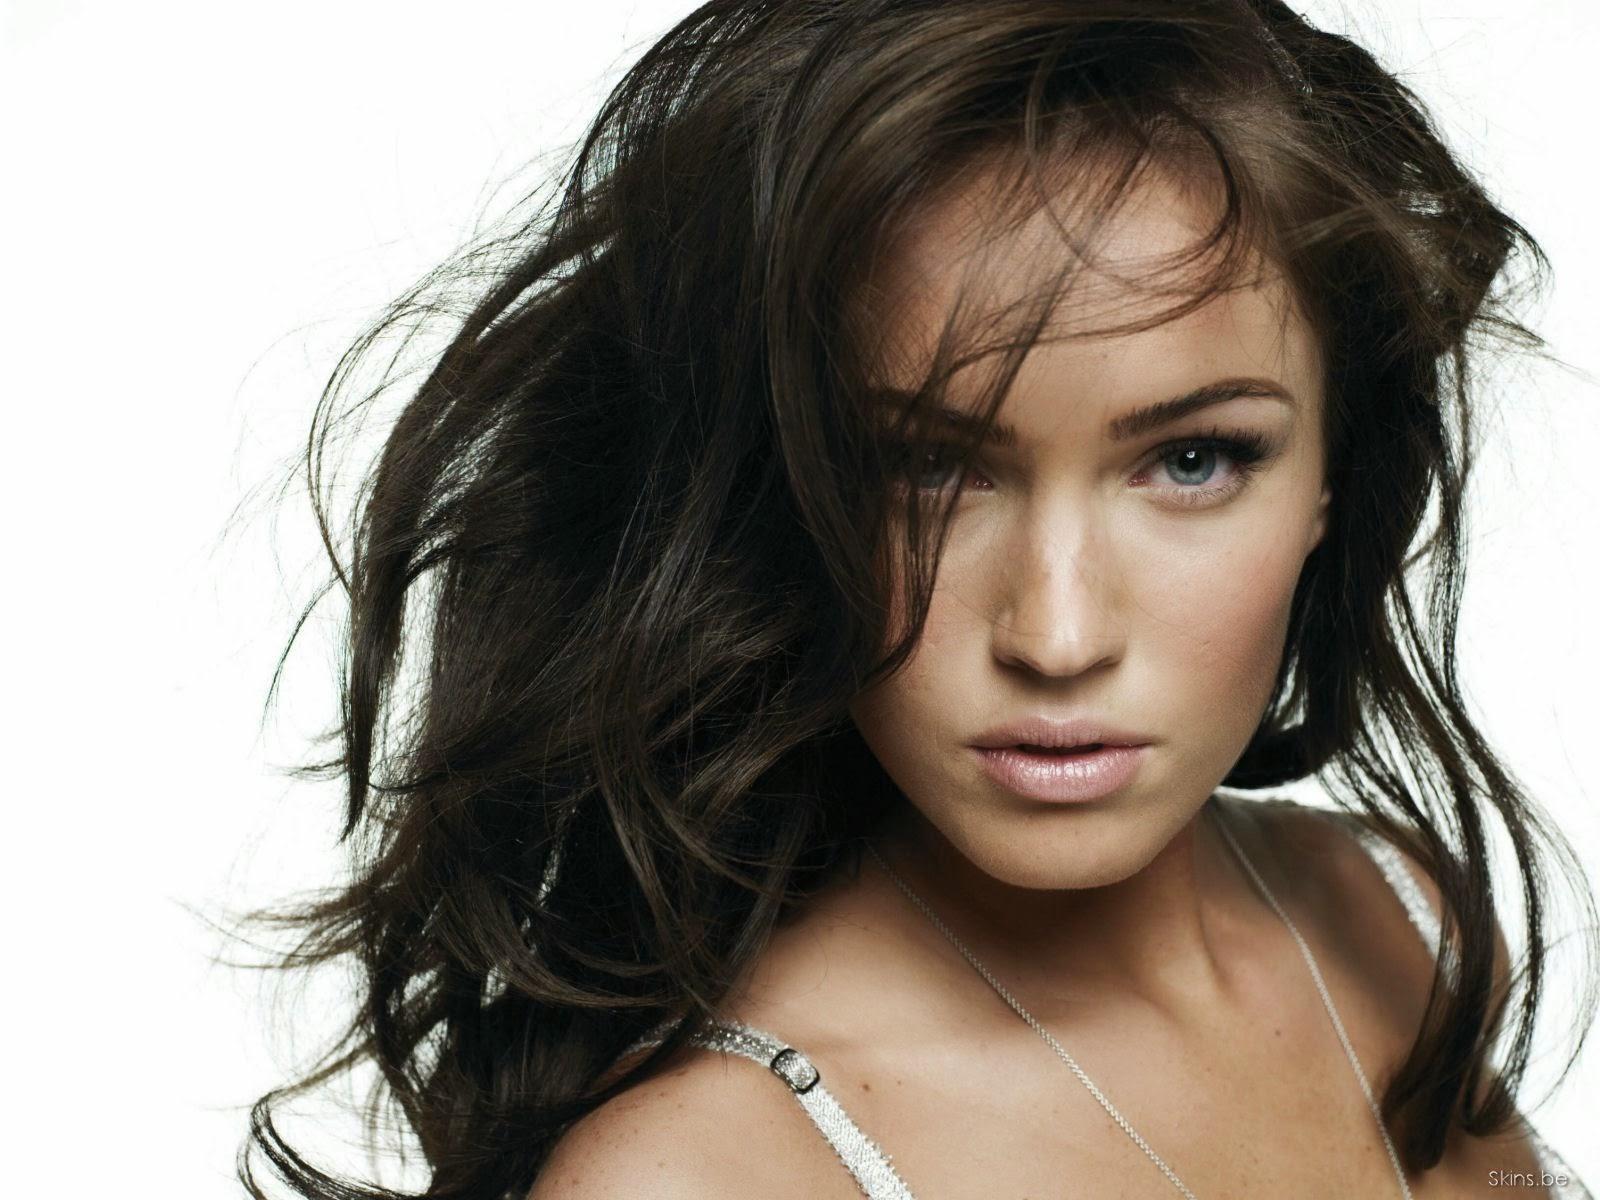 celebrity hd wallpapers  american actress megan fox sexy